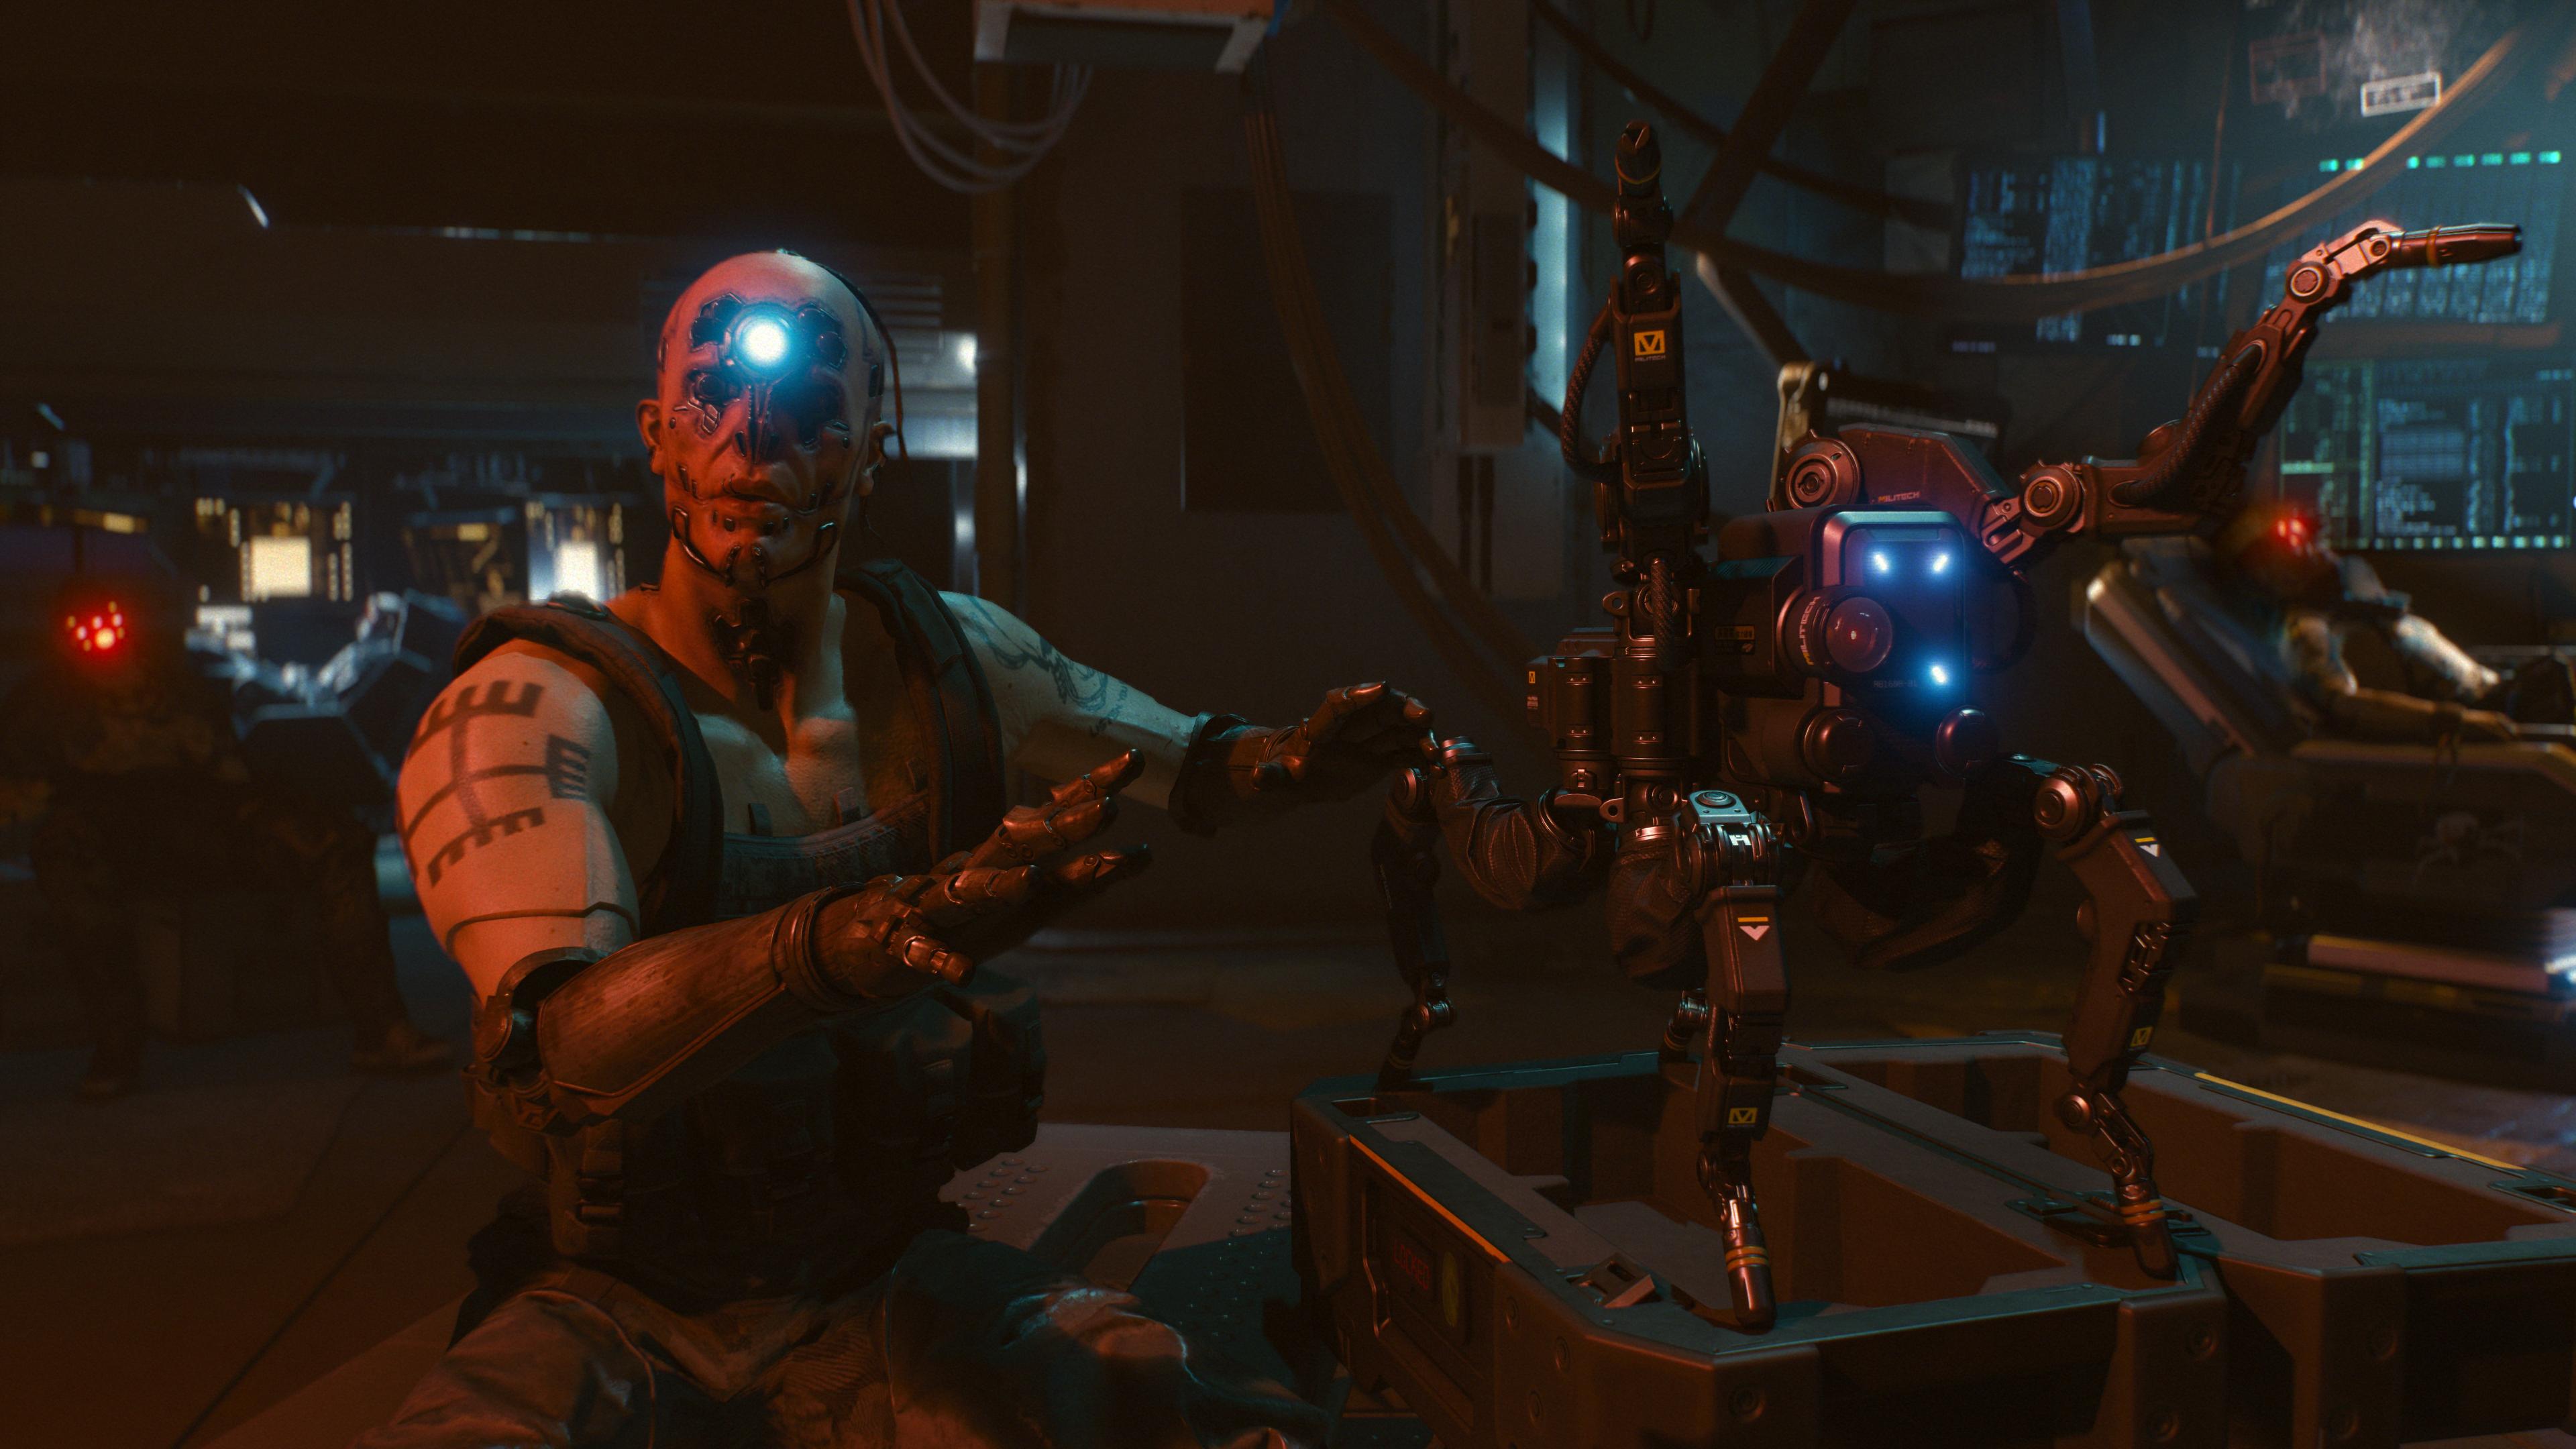 Game Cyberpunk 2077 2019 64